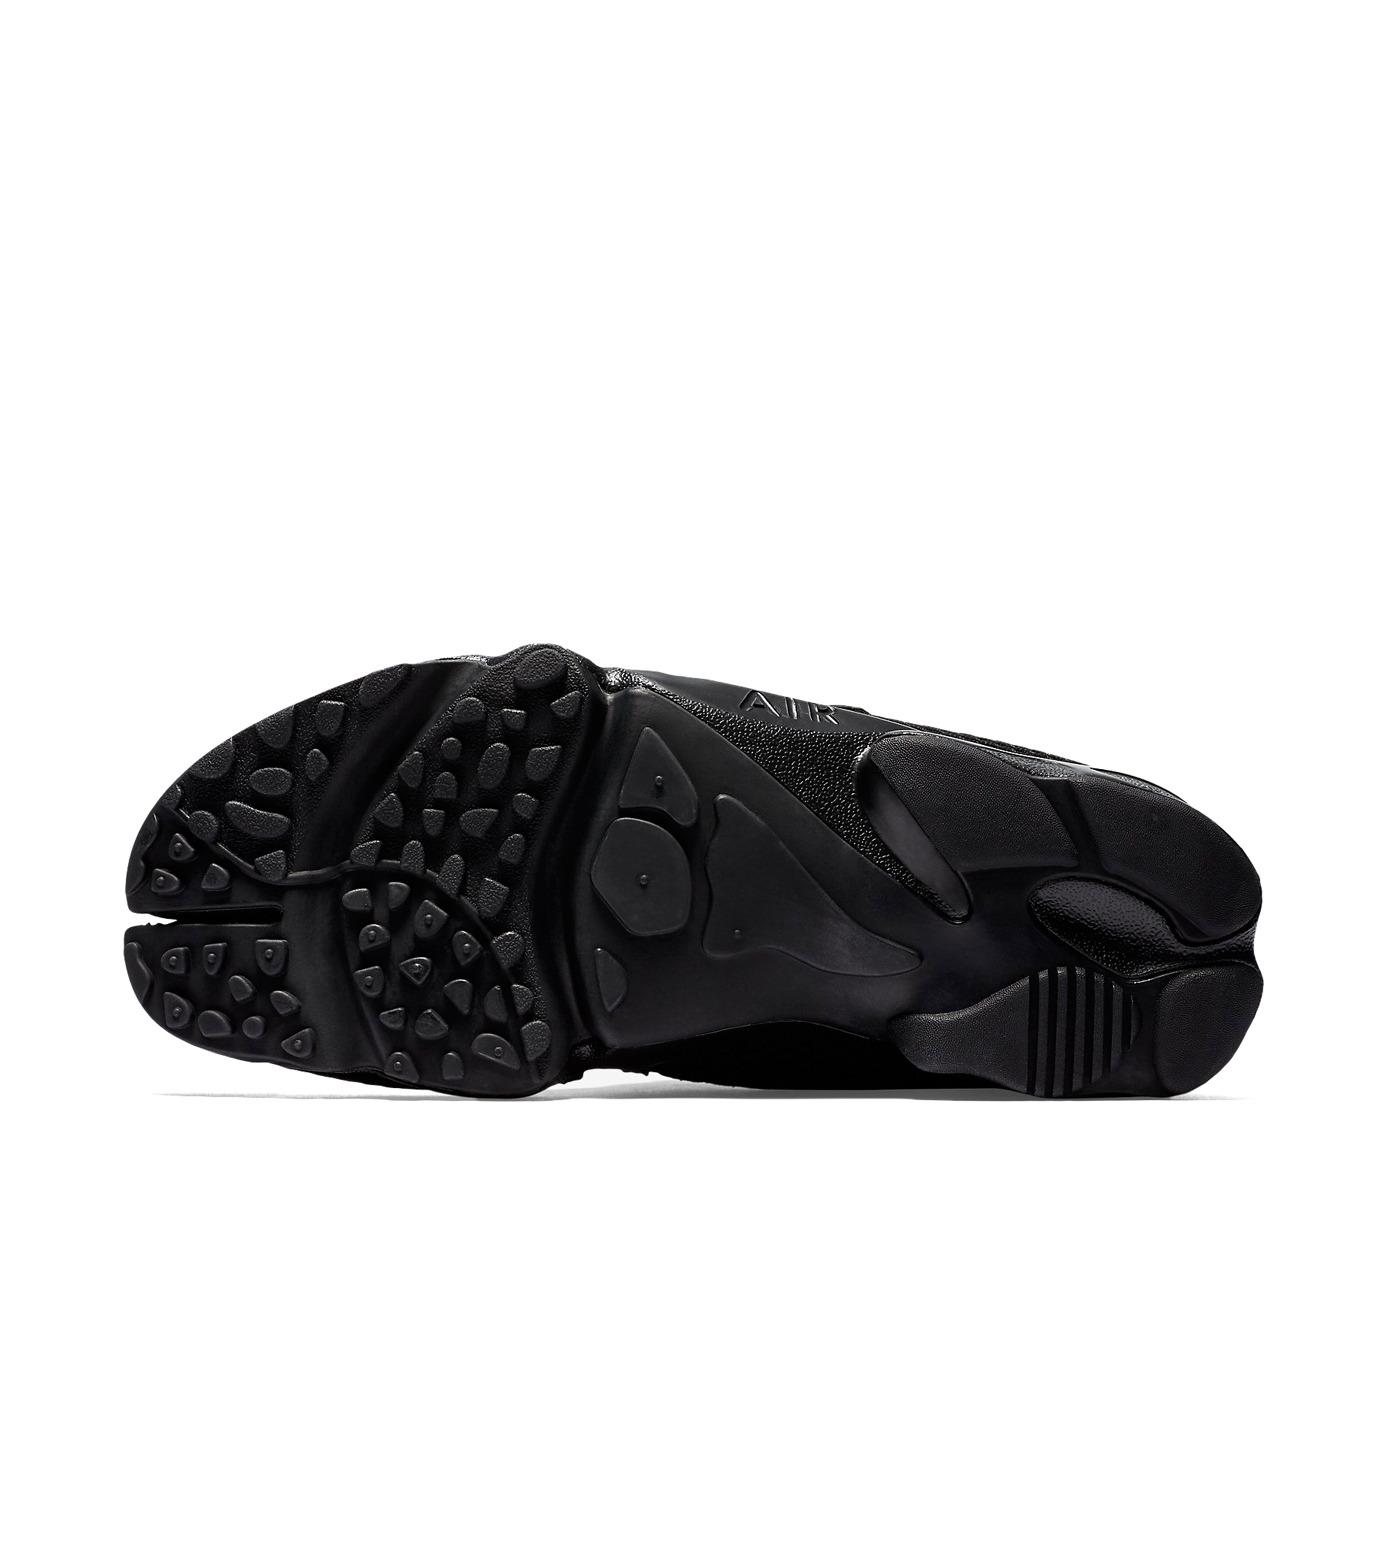 NIKE(ナイキ)のAir Rift Breathe-BLACK(シューズ/shoes)-847609-001-13 拡大詳細画像2